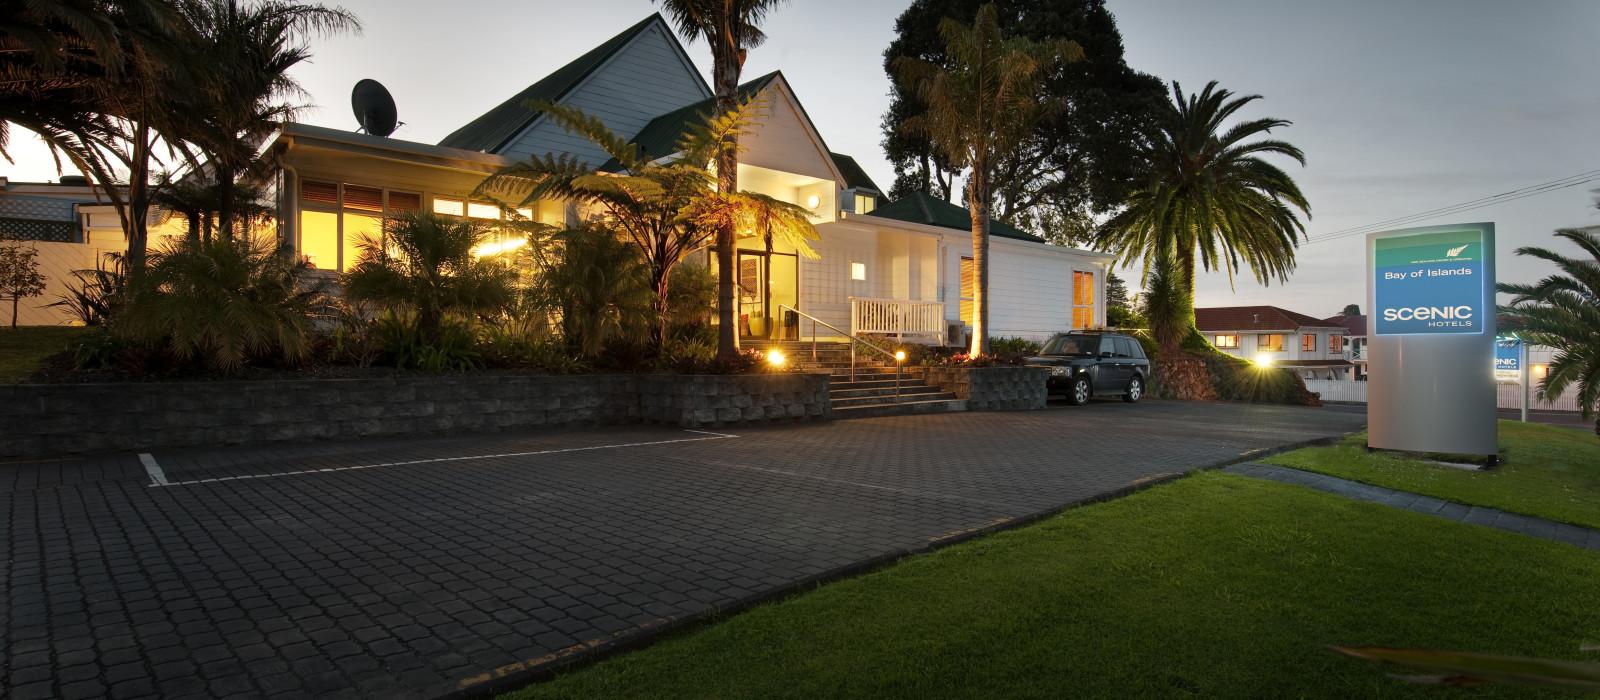 Hotel Scenic Bay Of Islands New Zealand